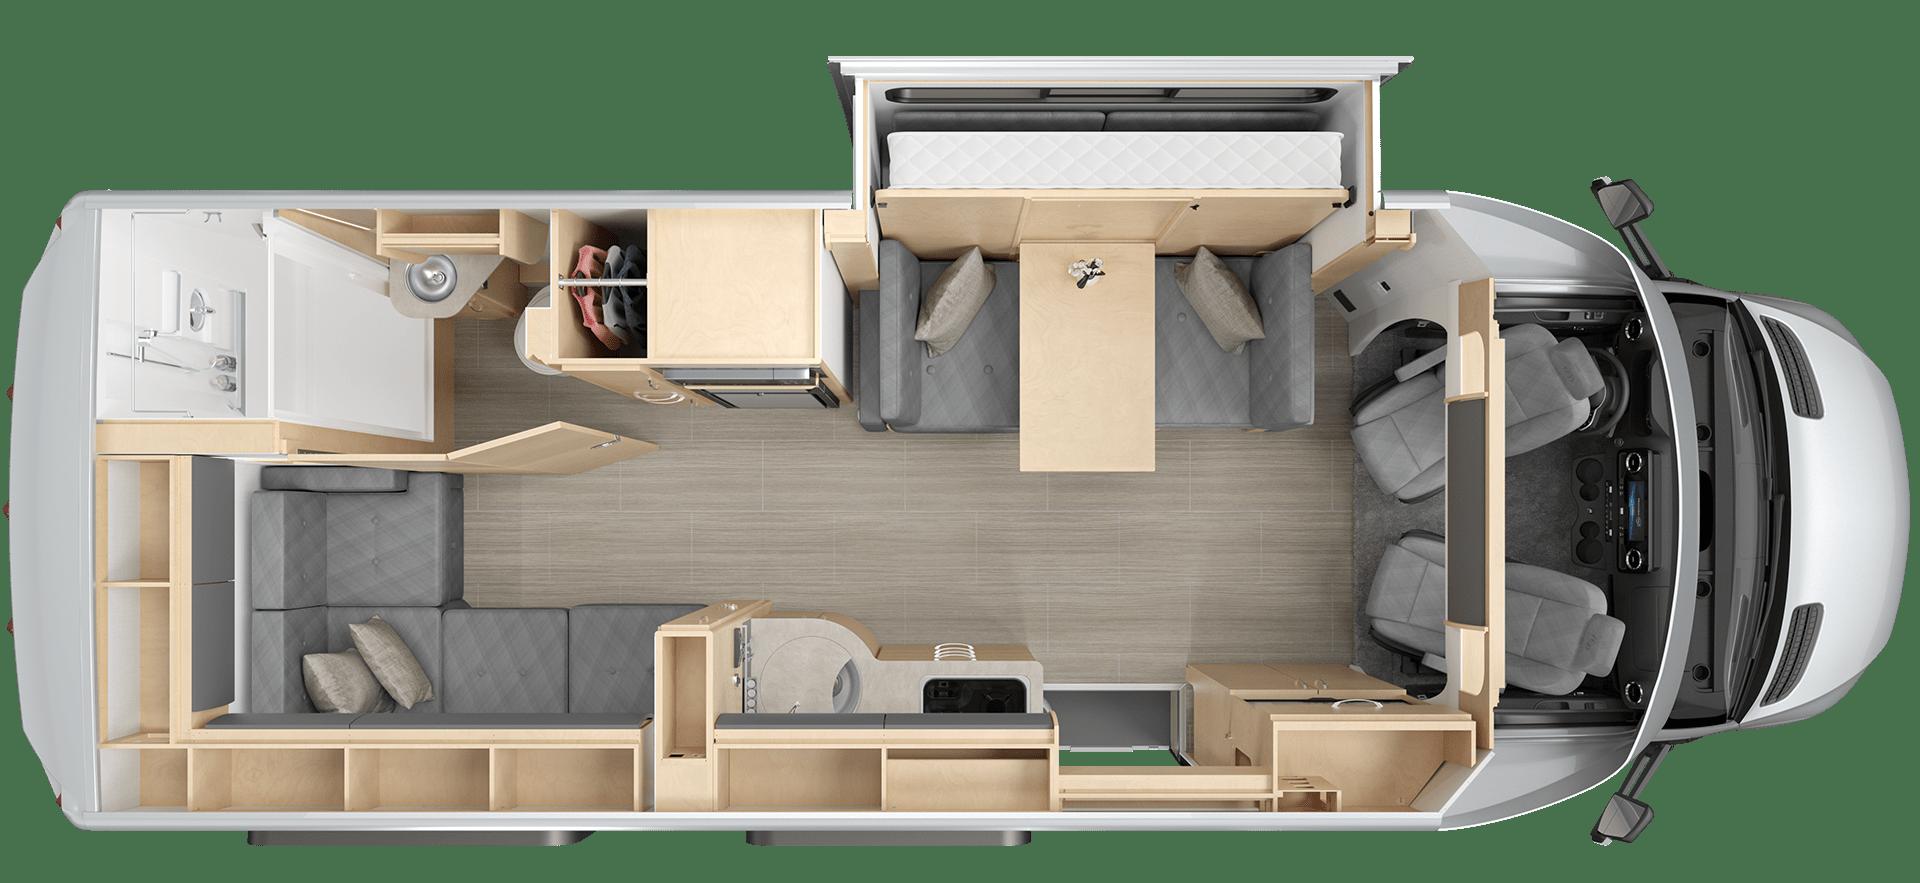 Unity FX Floorplan